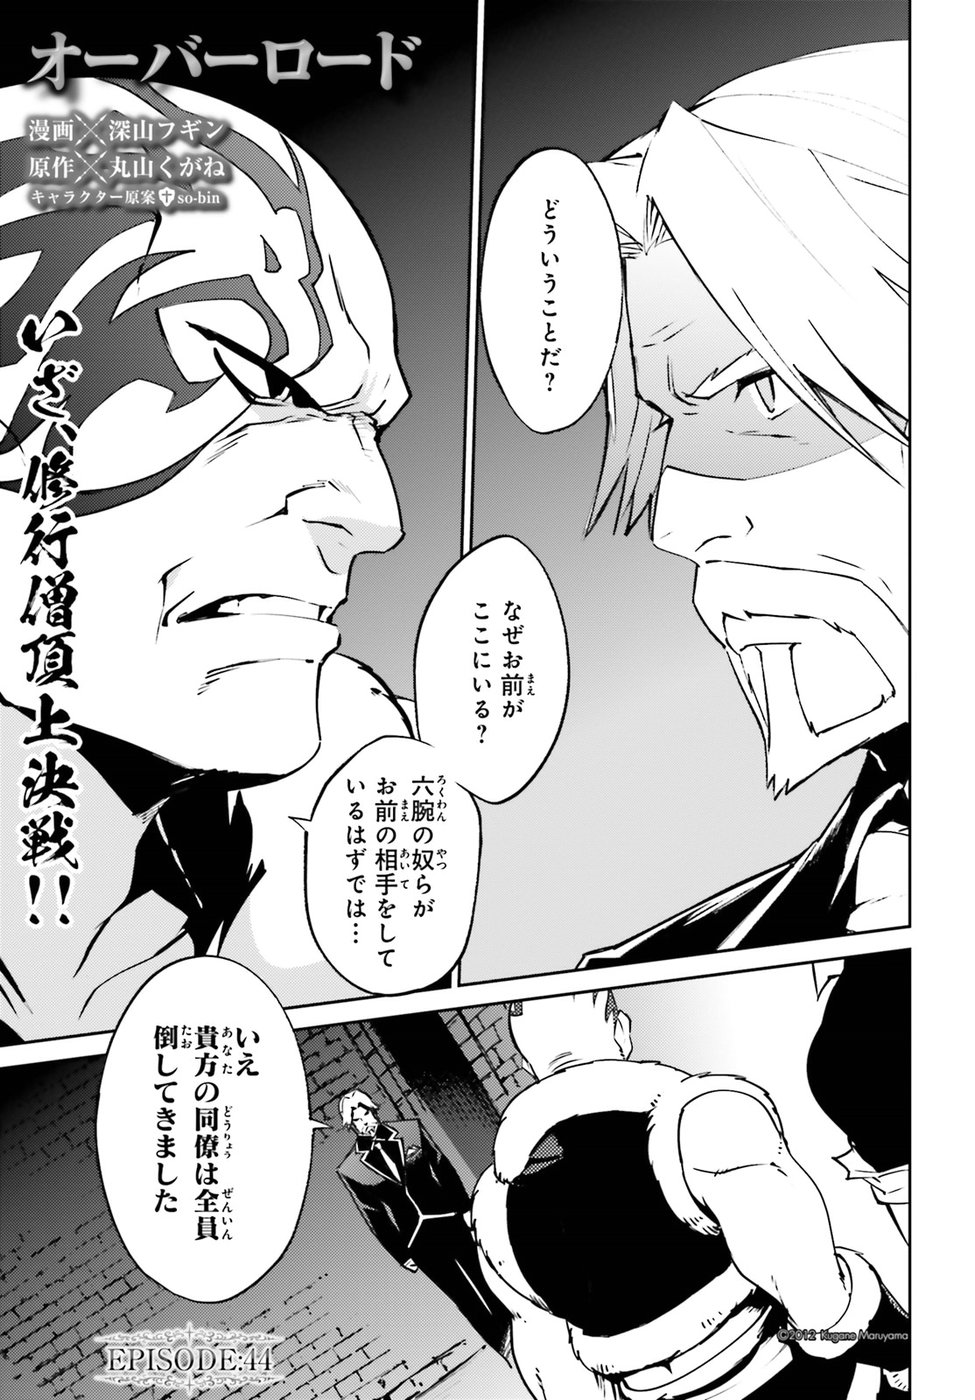 Overlord Manga Chapter 44